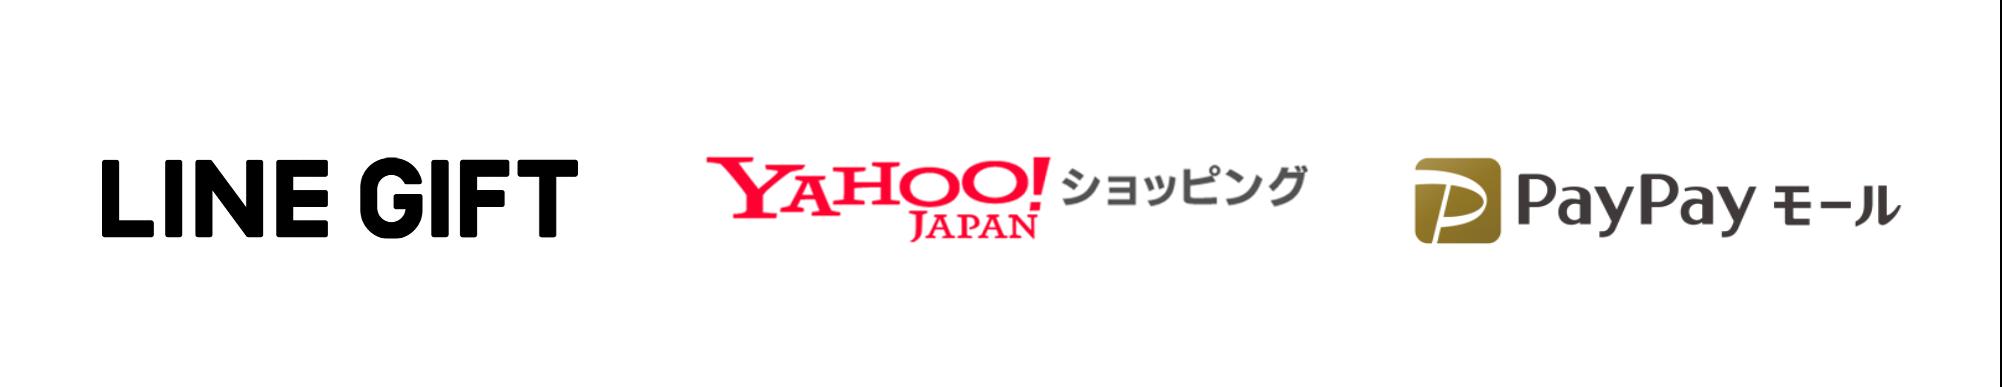 https://d.line-scdn.net/stf/linecorp/ja/pr/gift_yshp_logo.png